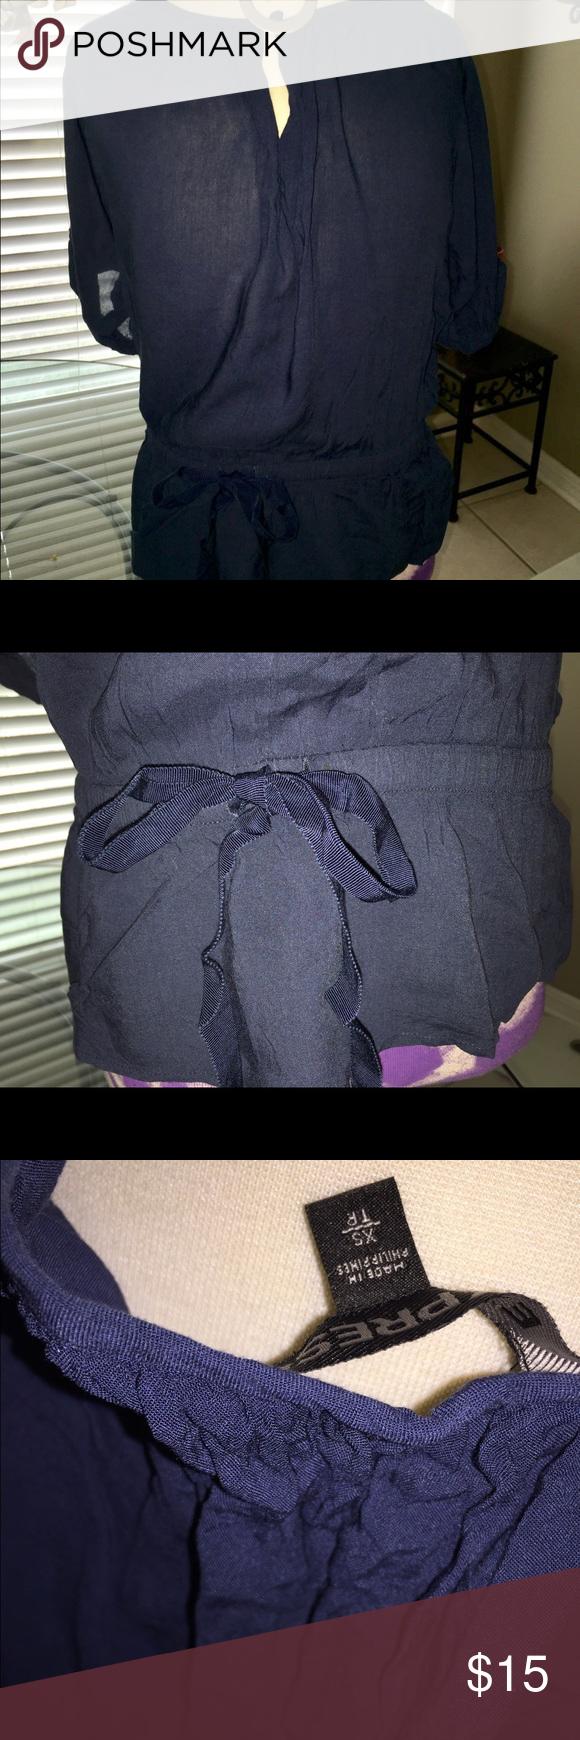 Indigo blue rayon shirt Beautiful indigo blue. Rayon with elastic belted waist. Worn once Express Tops Blouses